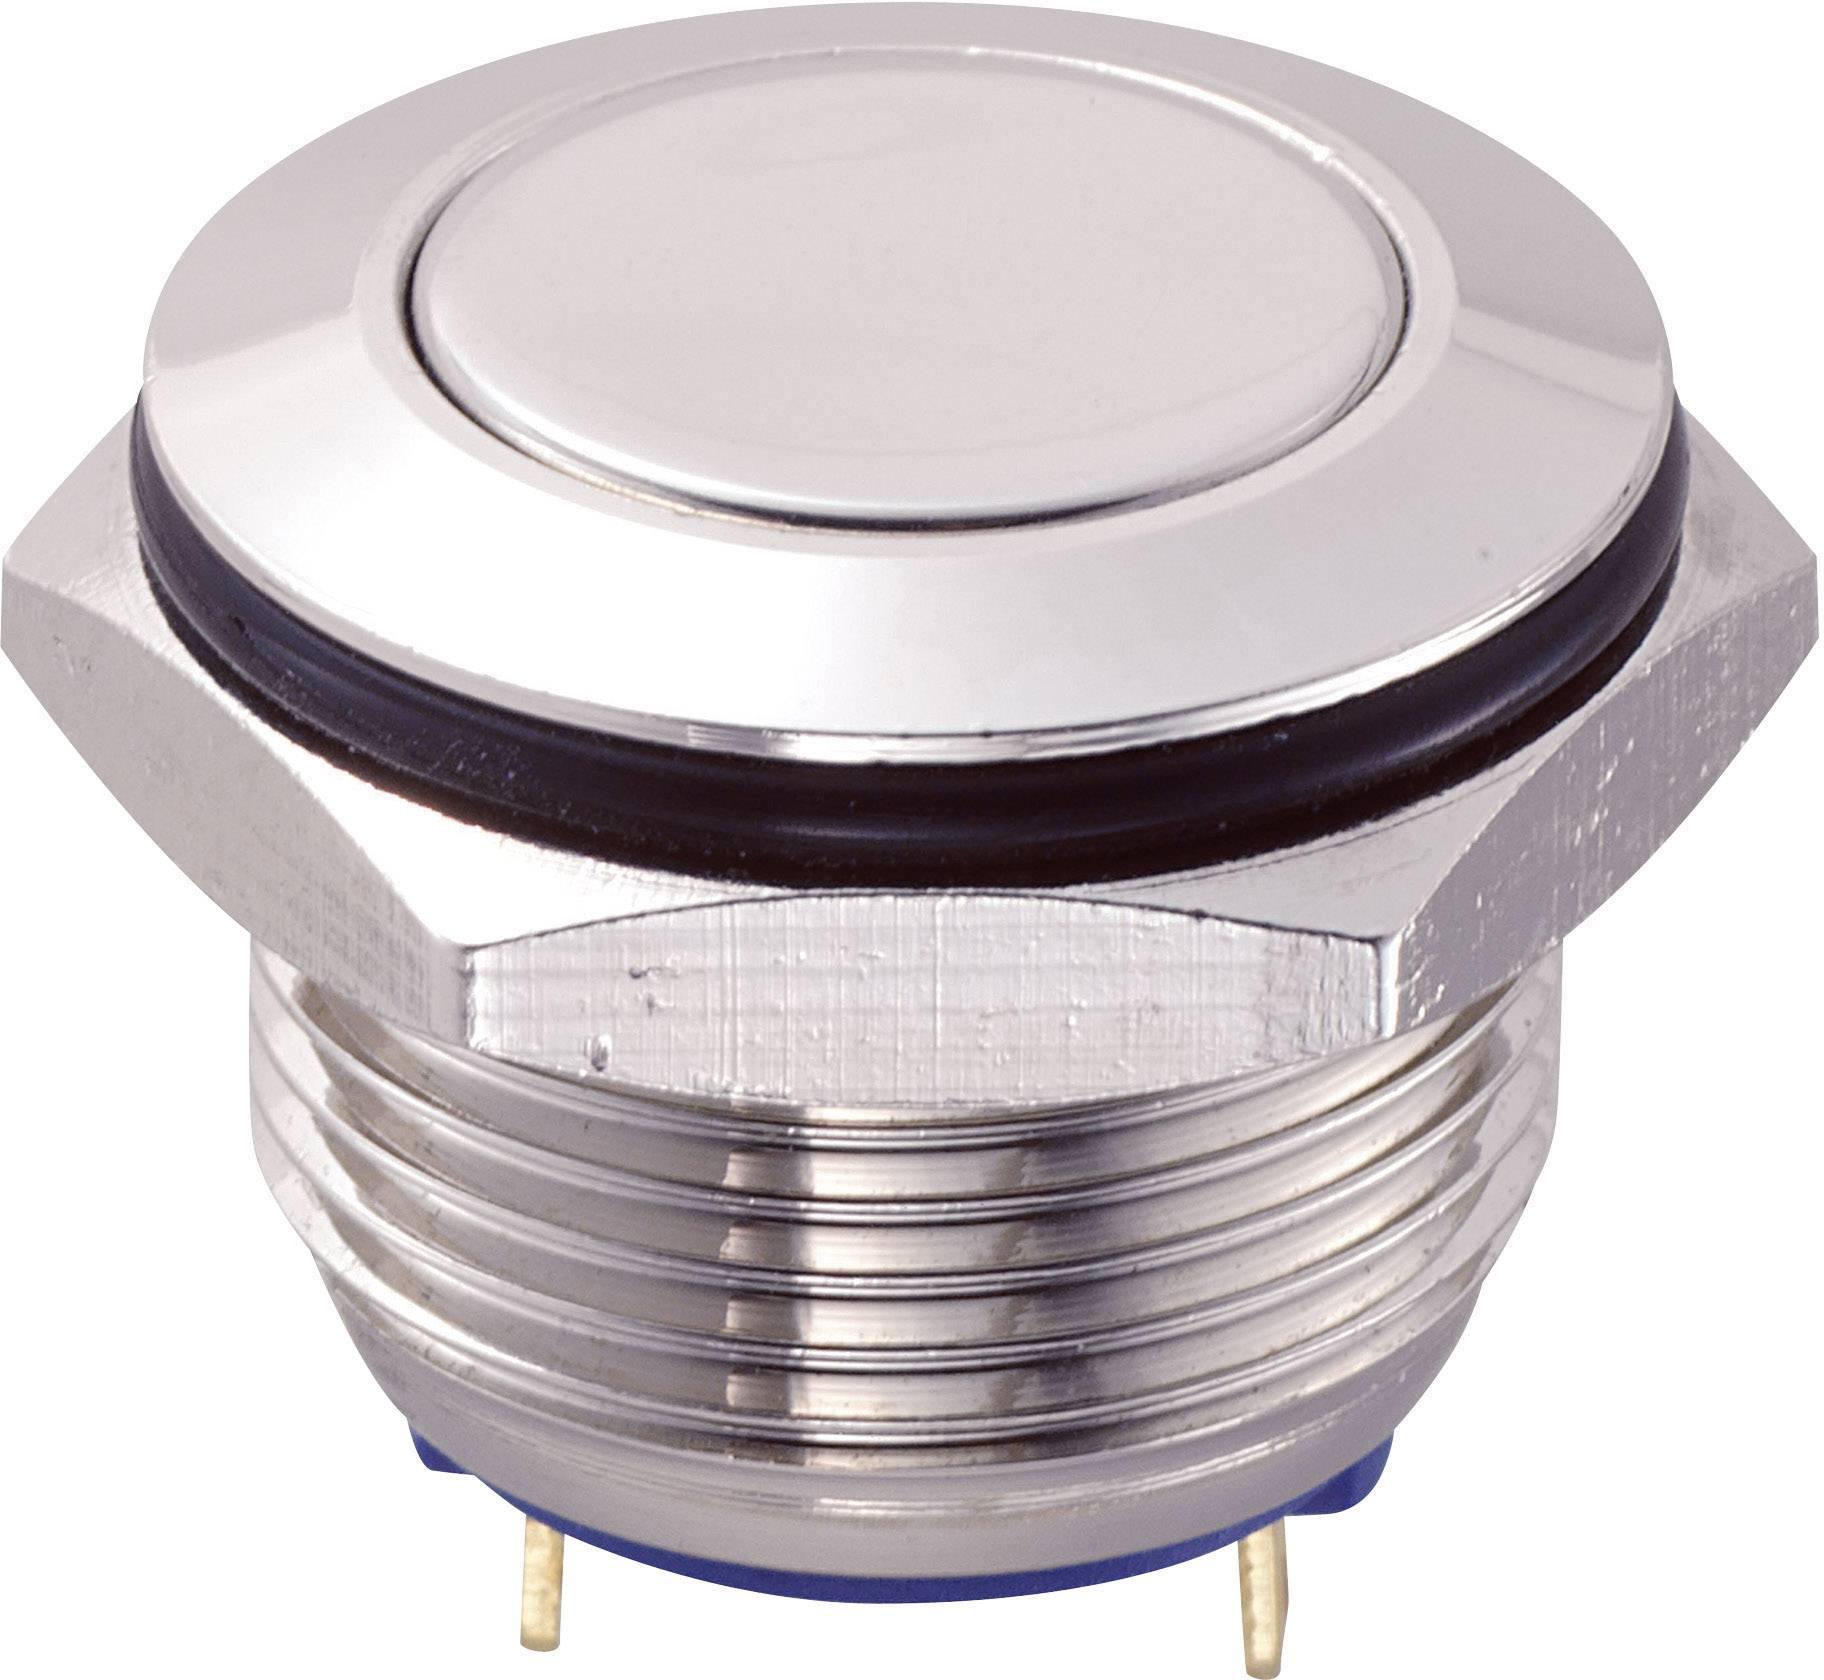 Tlačítko GQ16F-10/J/N (SH1149), 16 mm, 48 V/DC, 2 A, pájené, 1x vyp/(zap)